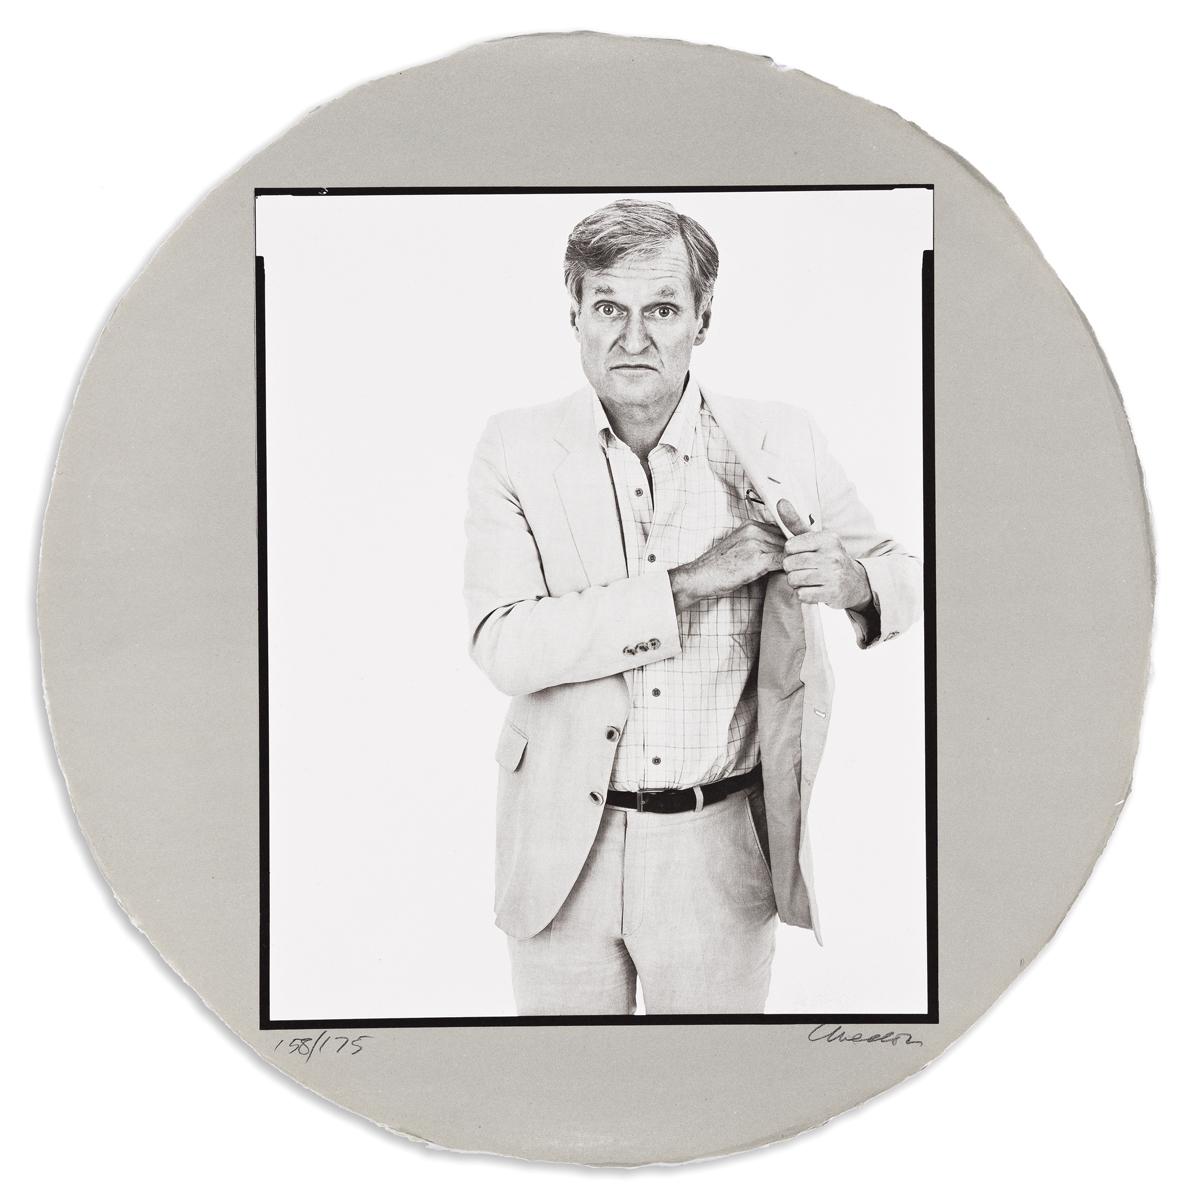 Self-Portrait in a Convex Mirror by John Ashbery.